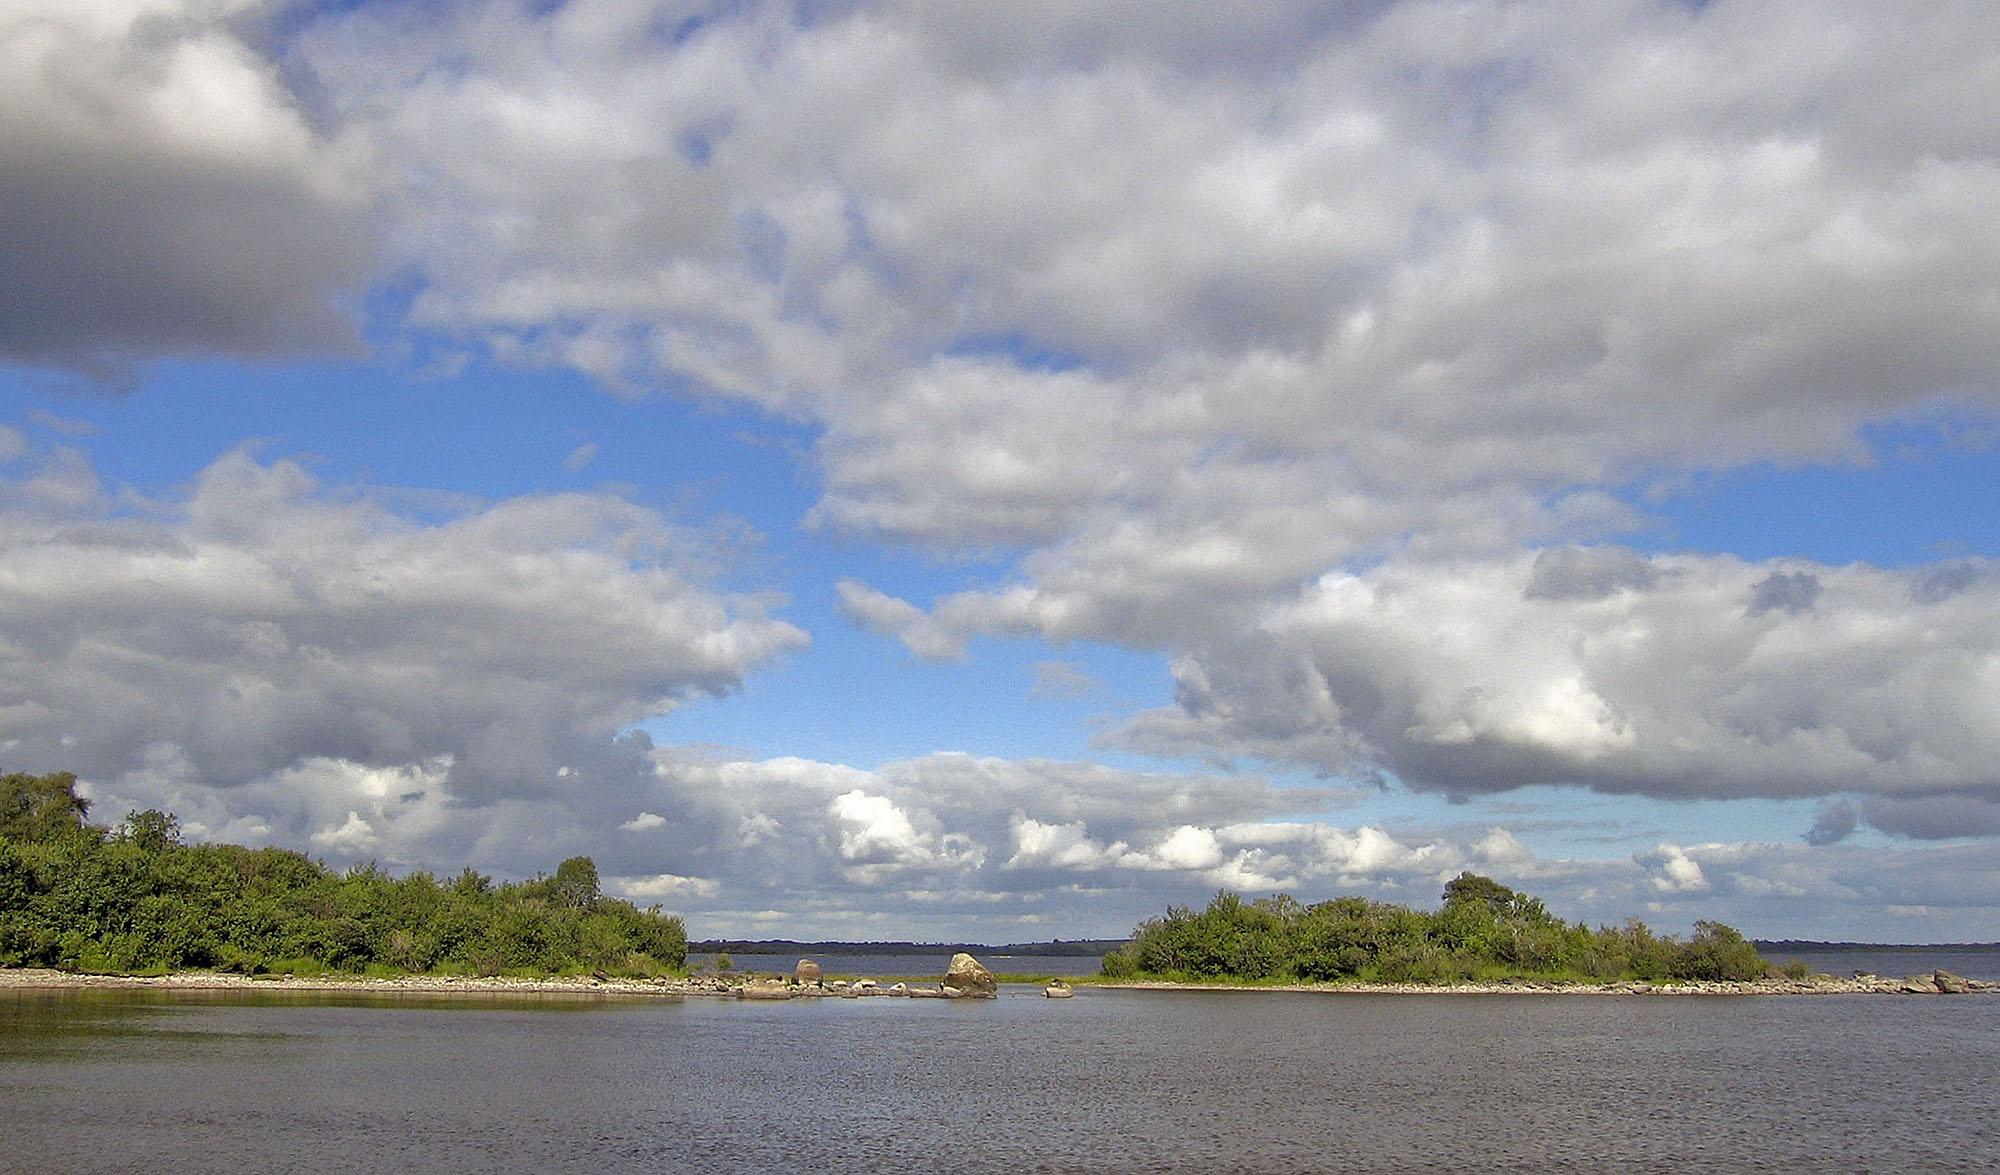 Island on Lough Mask - Ireland